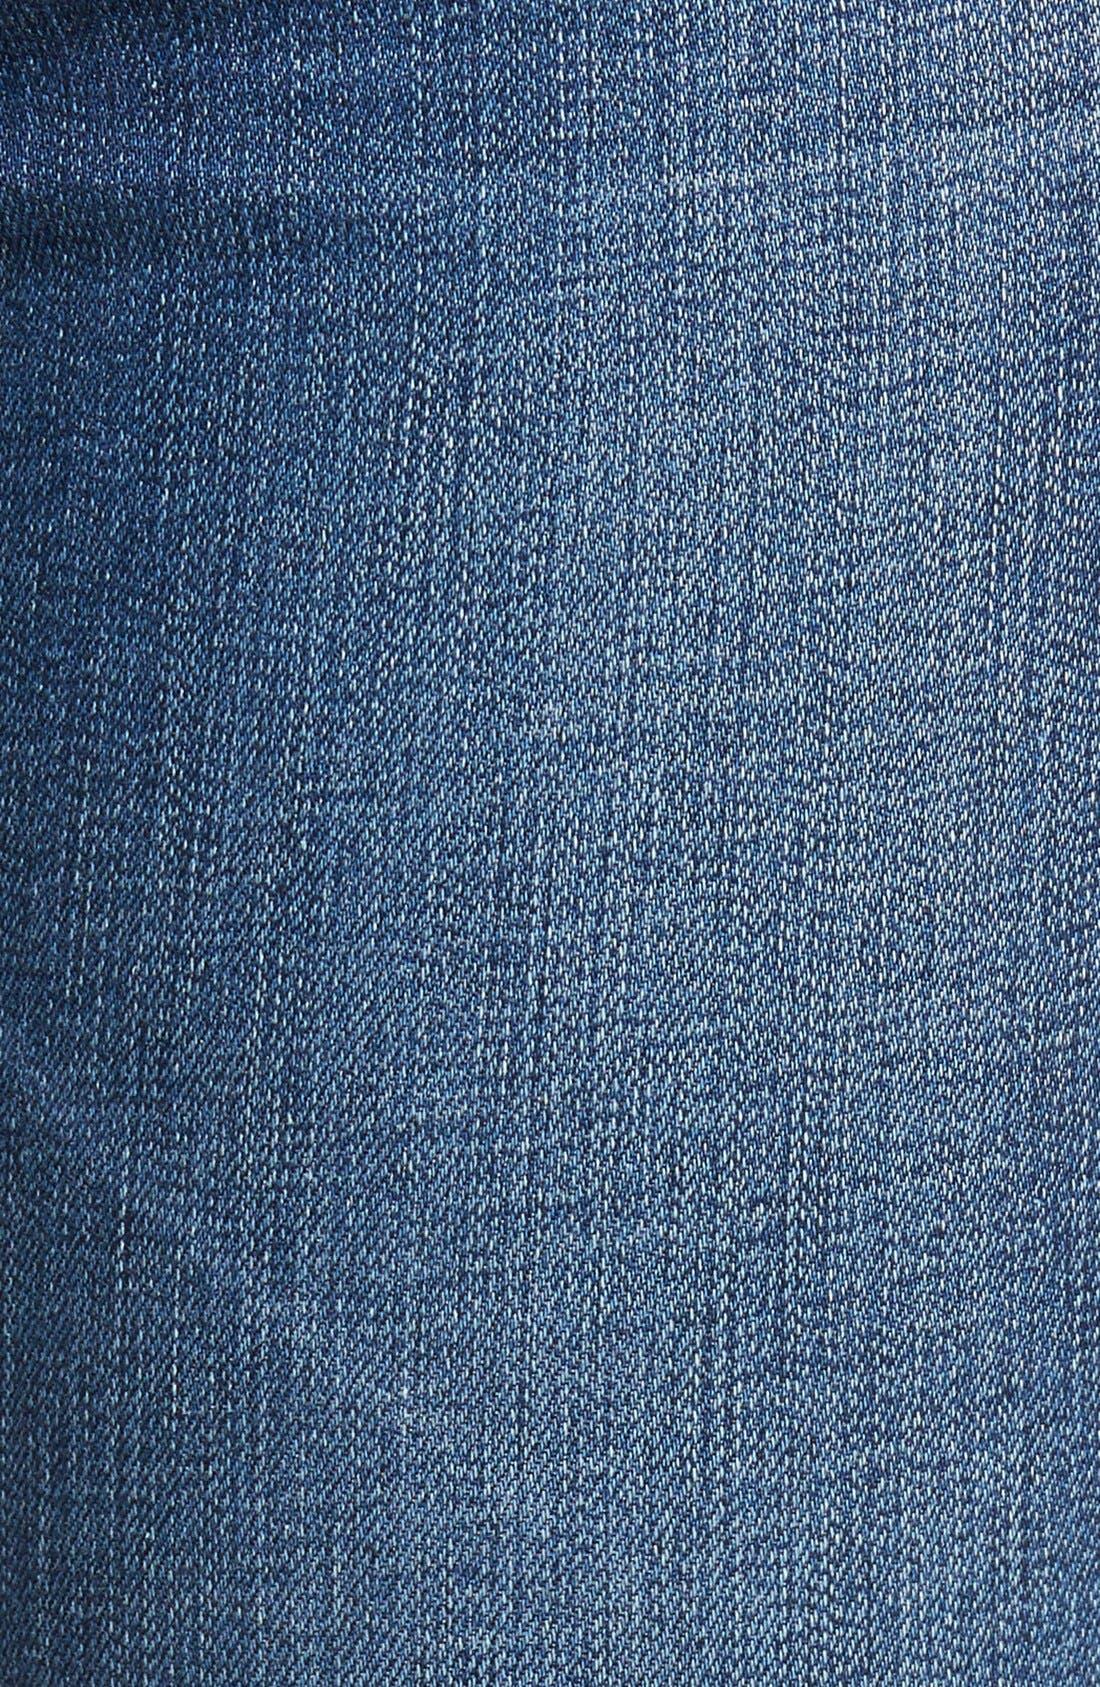 Alternate Image 6  - AG 'The Legging' Ankle Jeans (7 Year Break with Raw Hem)